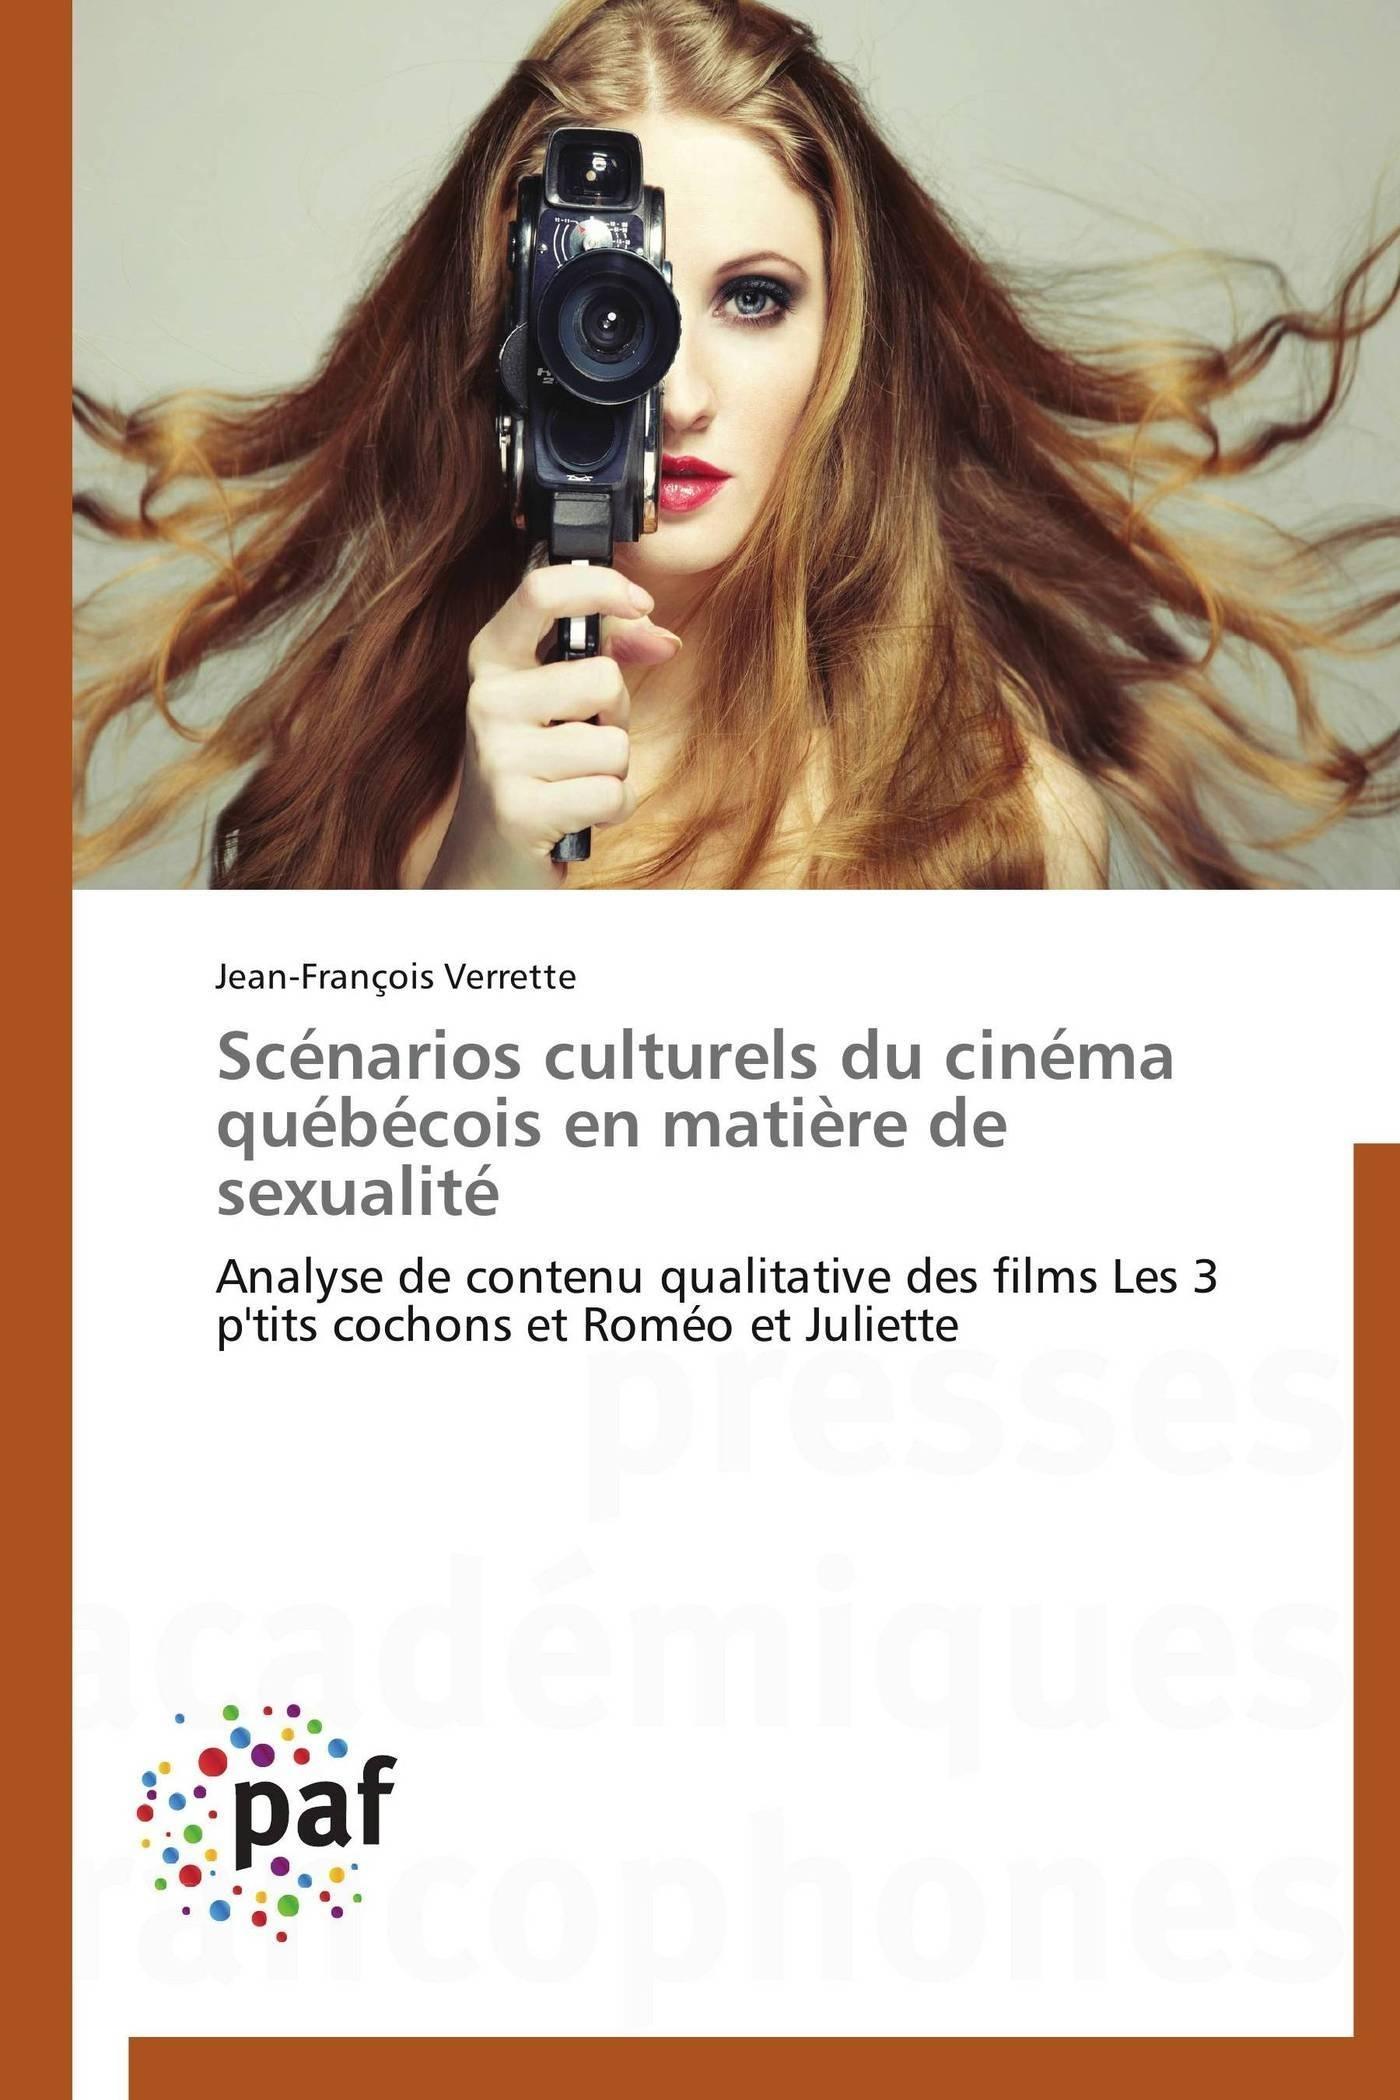 SCENARIOS CULTURELS DU CINEMA QUEBECOIS EN MATIERE DE SEXUALITE